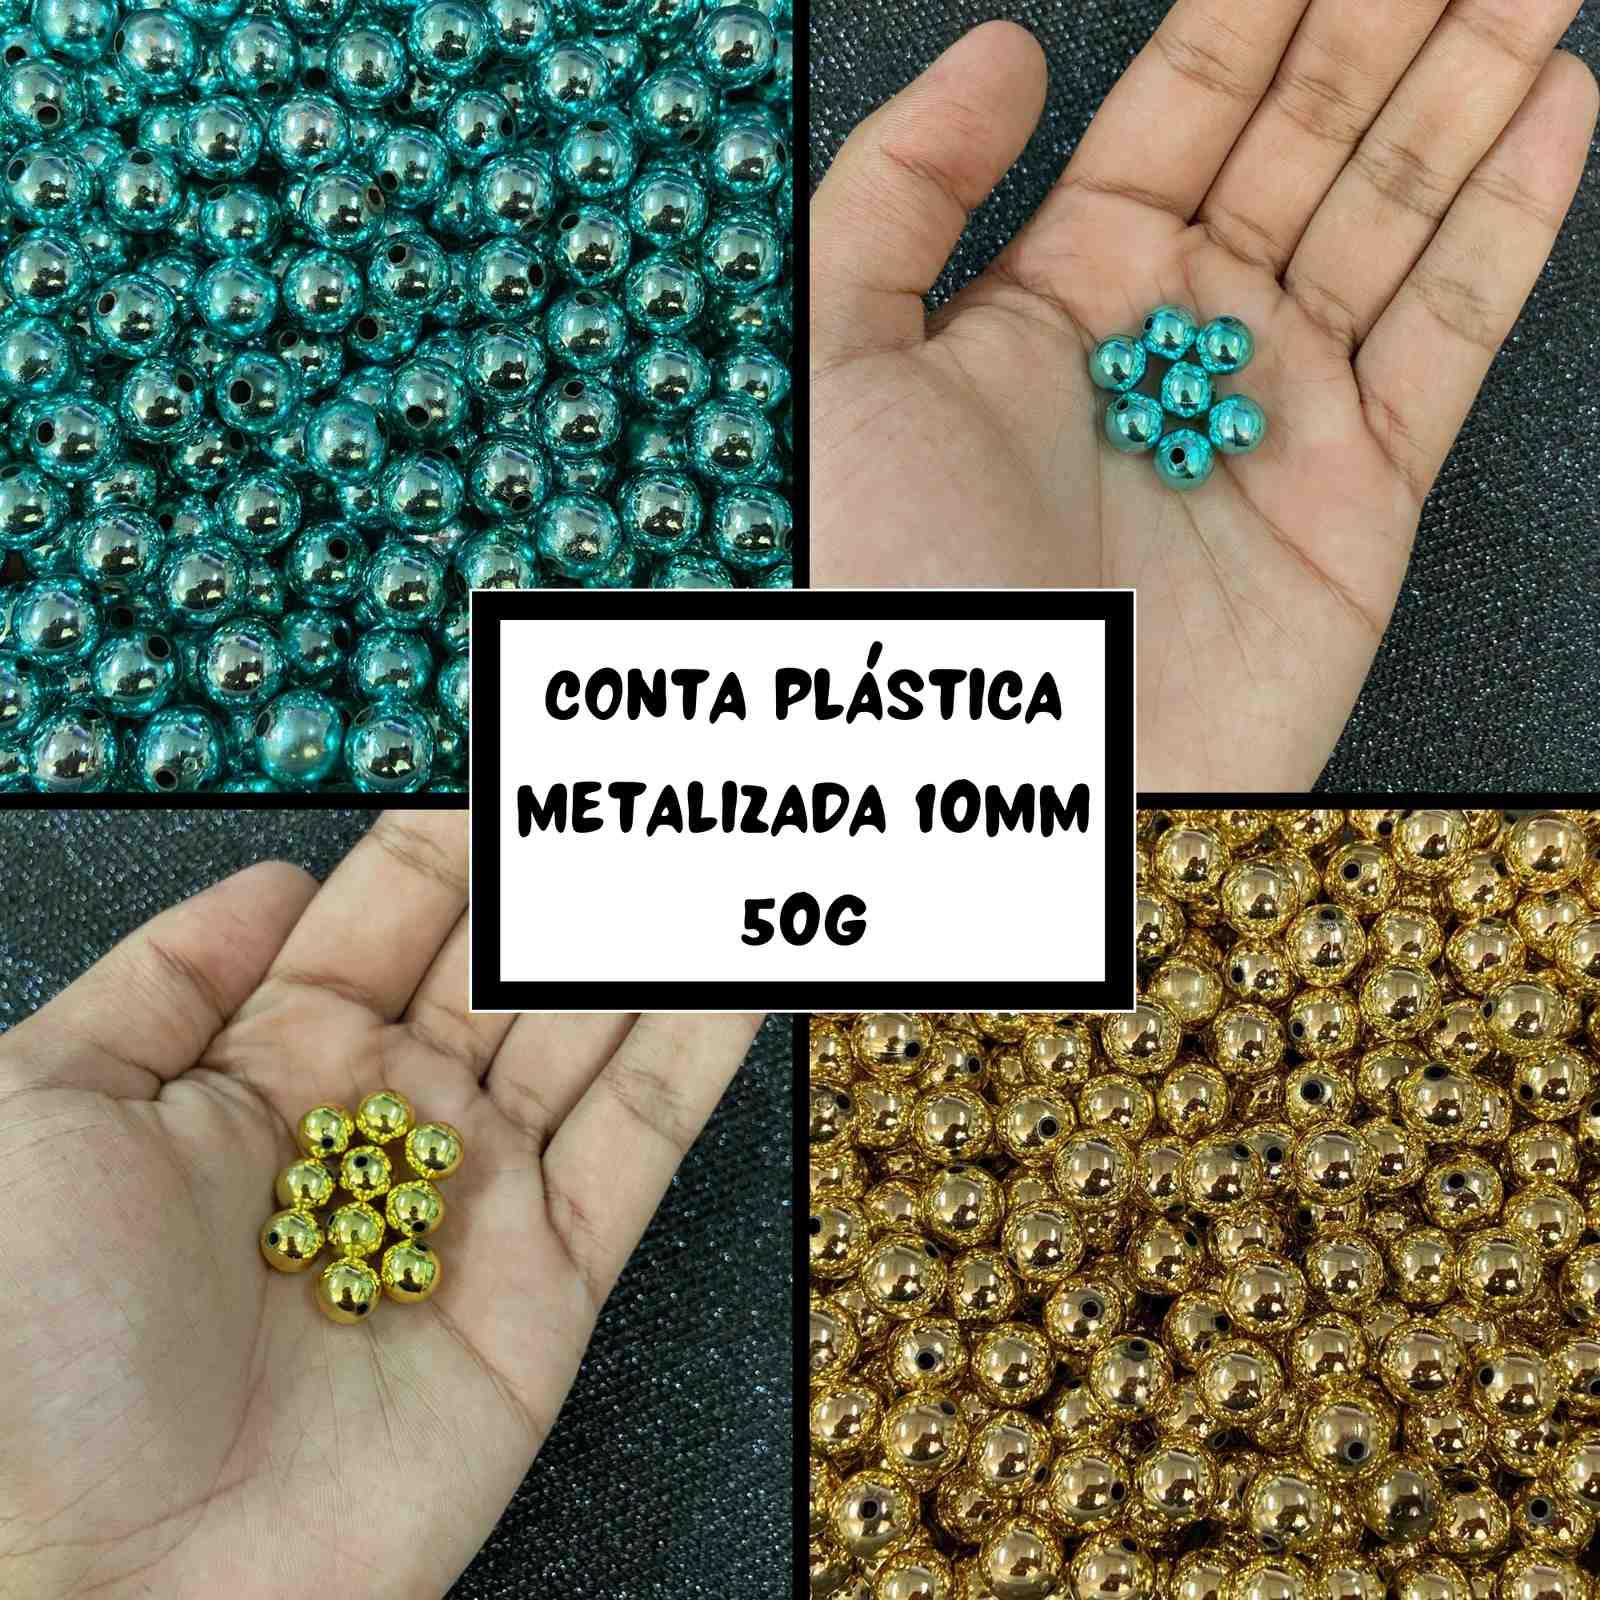 Conta Plástica Metalizada 10mm - 50g